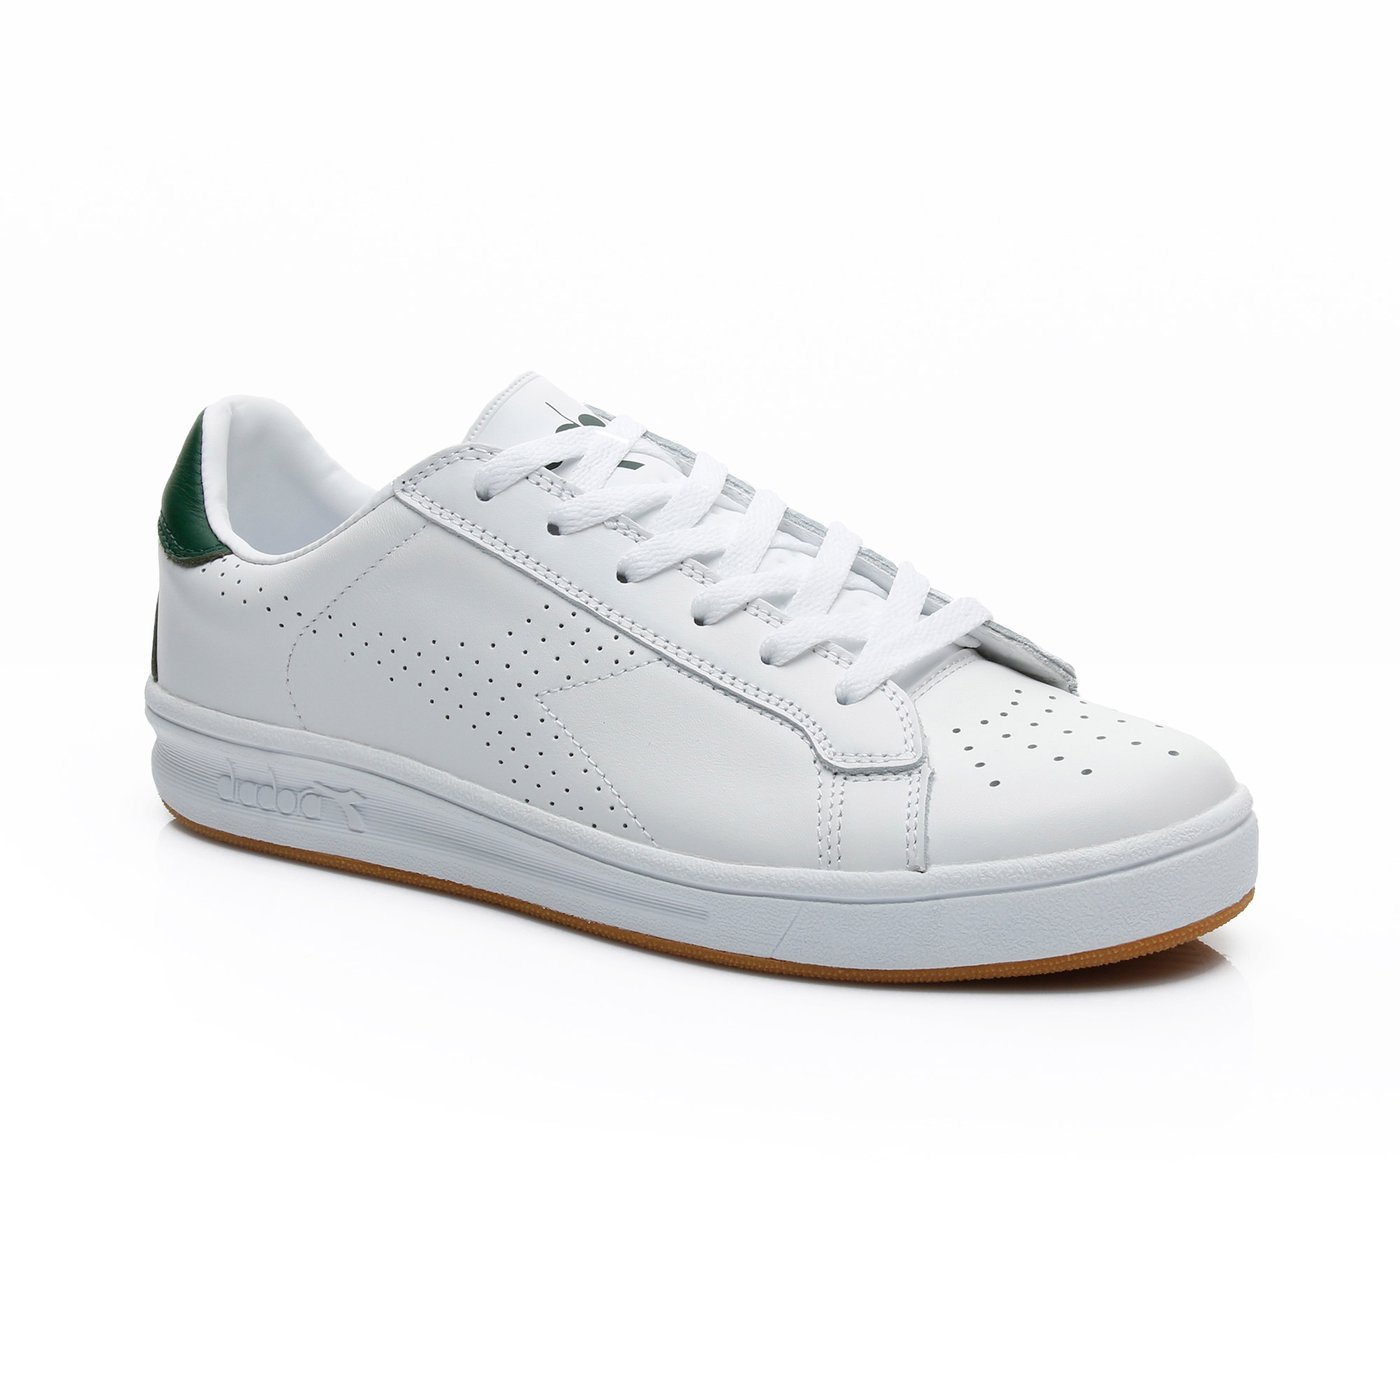 materiali di alta qualità grande sconto per tutta la famiglia Diadora Martin Erkek Beyaz Sneaker